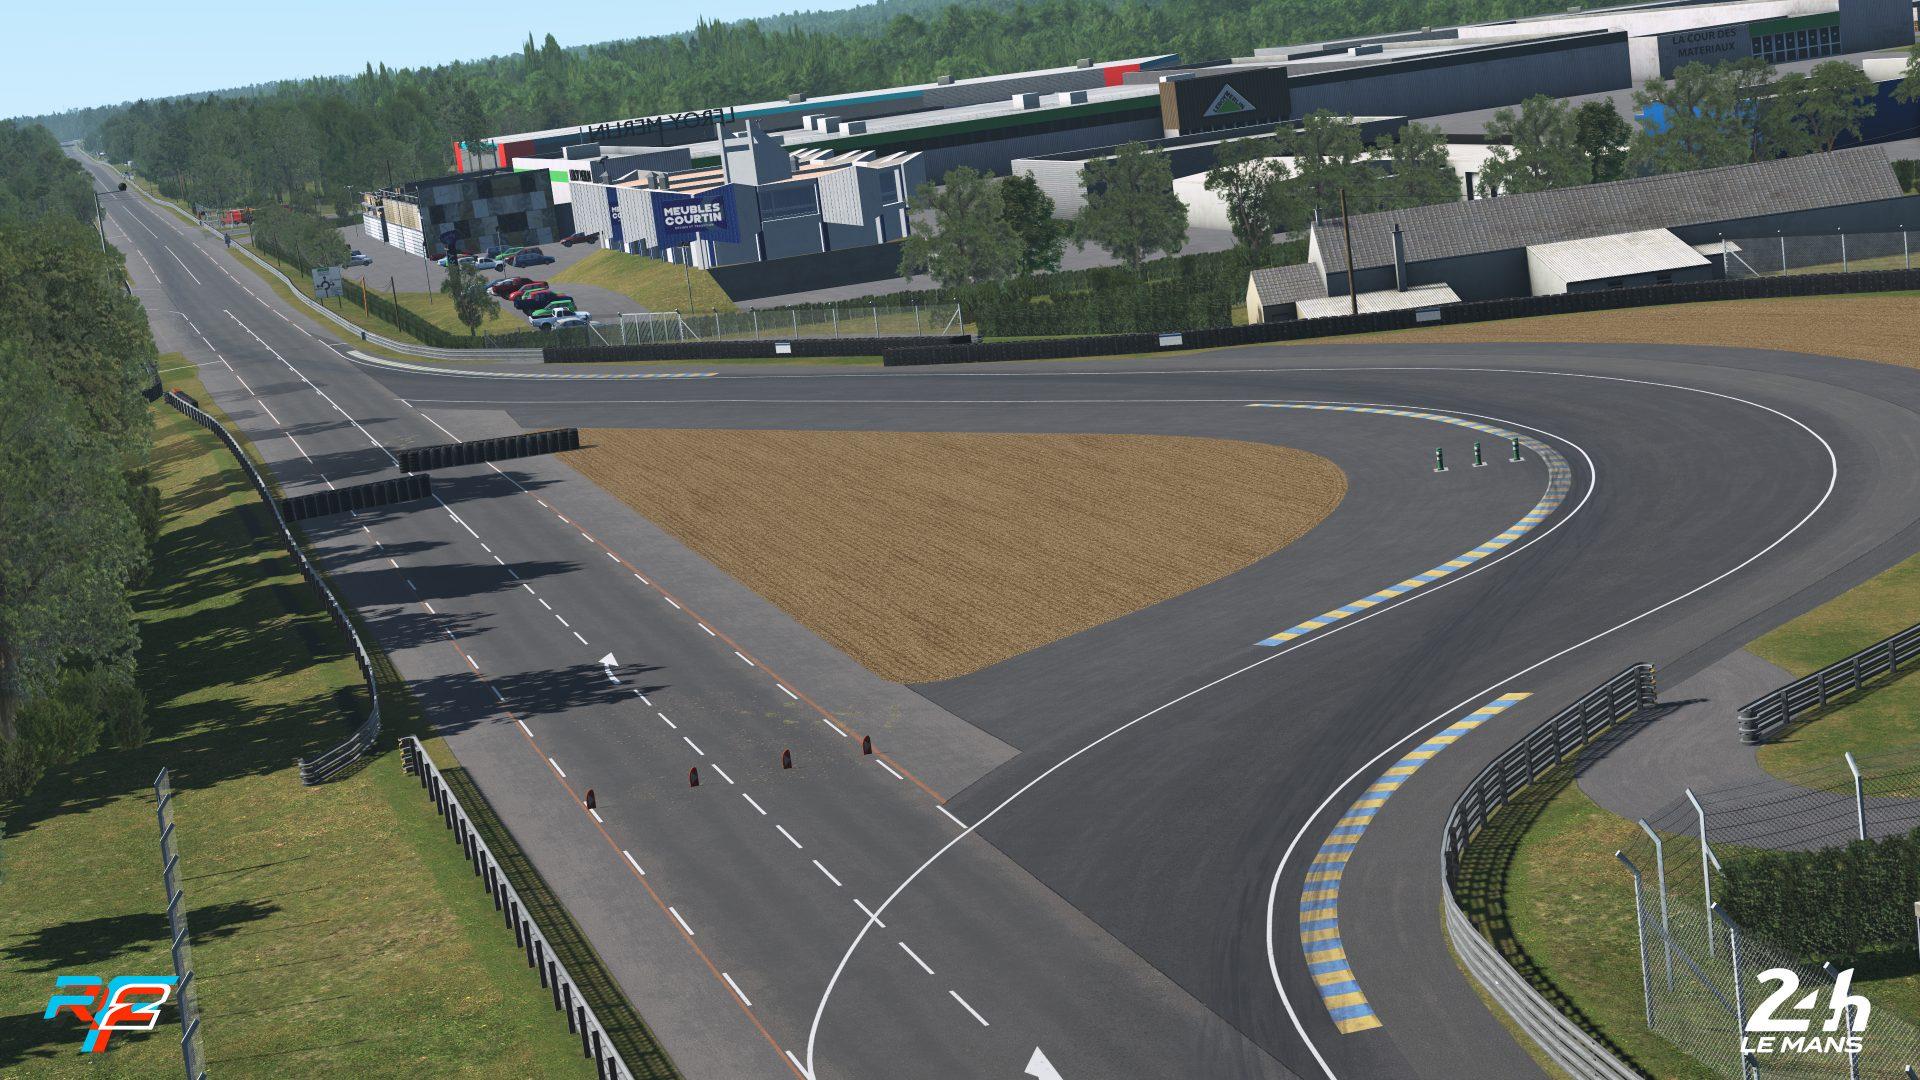 Le-Mans-track-guide-011-1920x1080.jpg